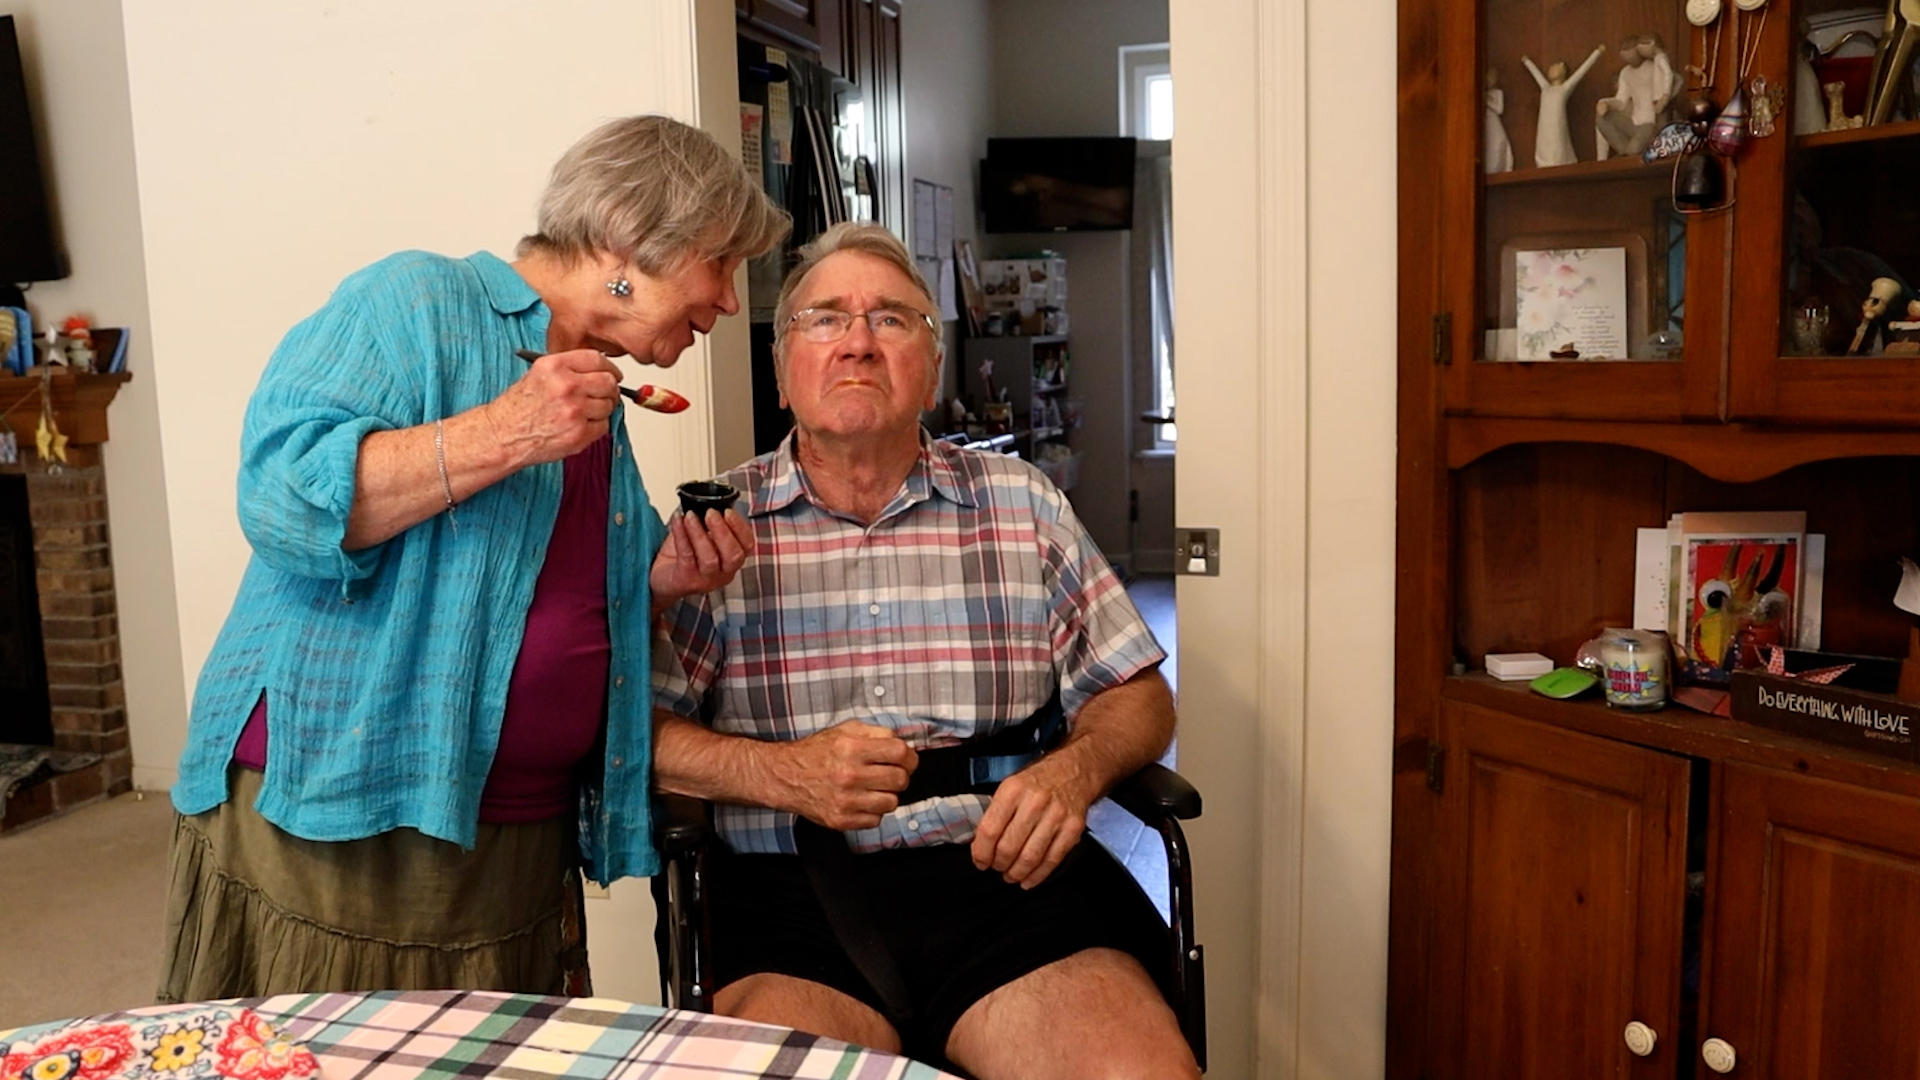 Caregiver taking care of her husband.